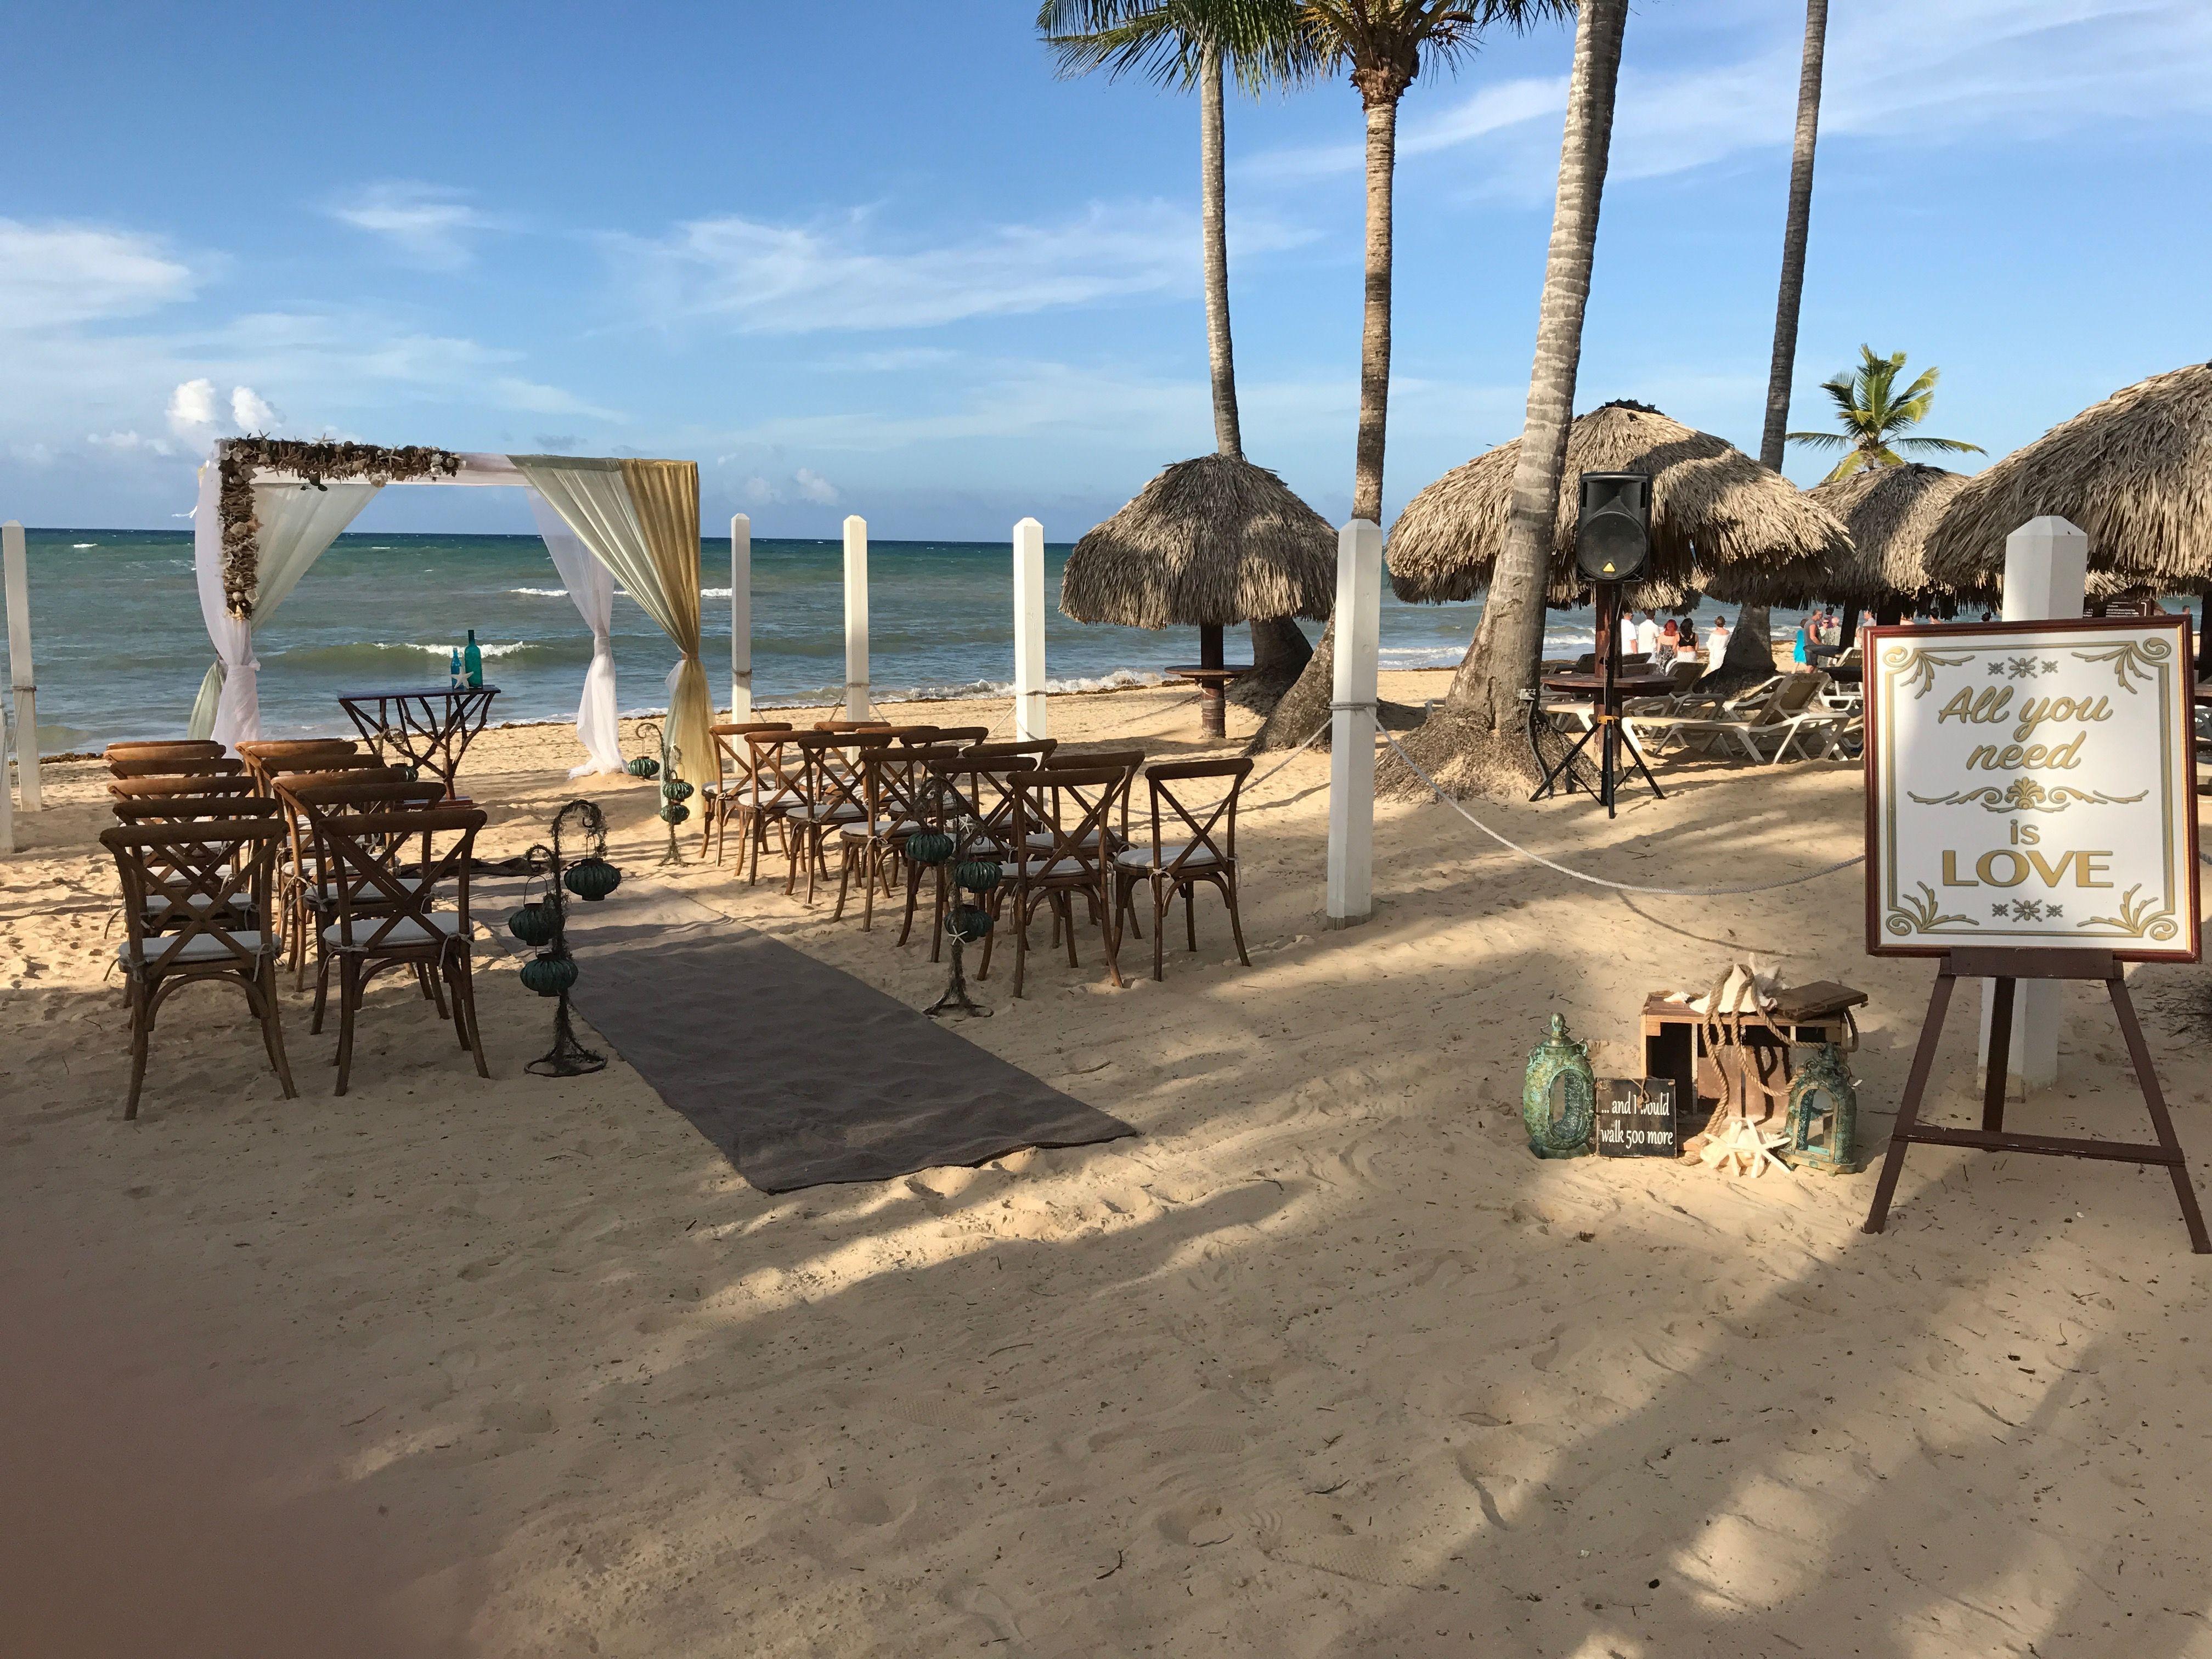 Beach Wedding Ceremony At Dreams Punta Cana Dreams Resorts Wedding Beach Ceremony Destination Wedding Planning